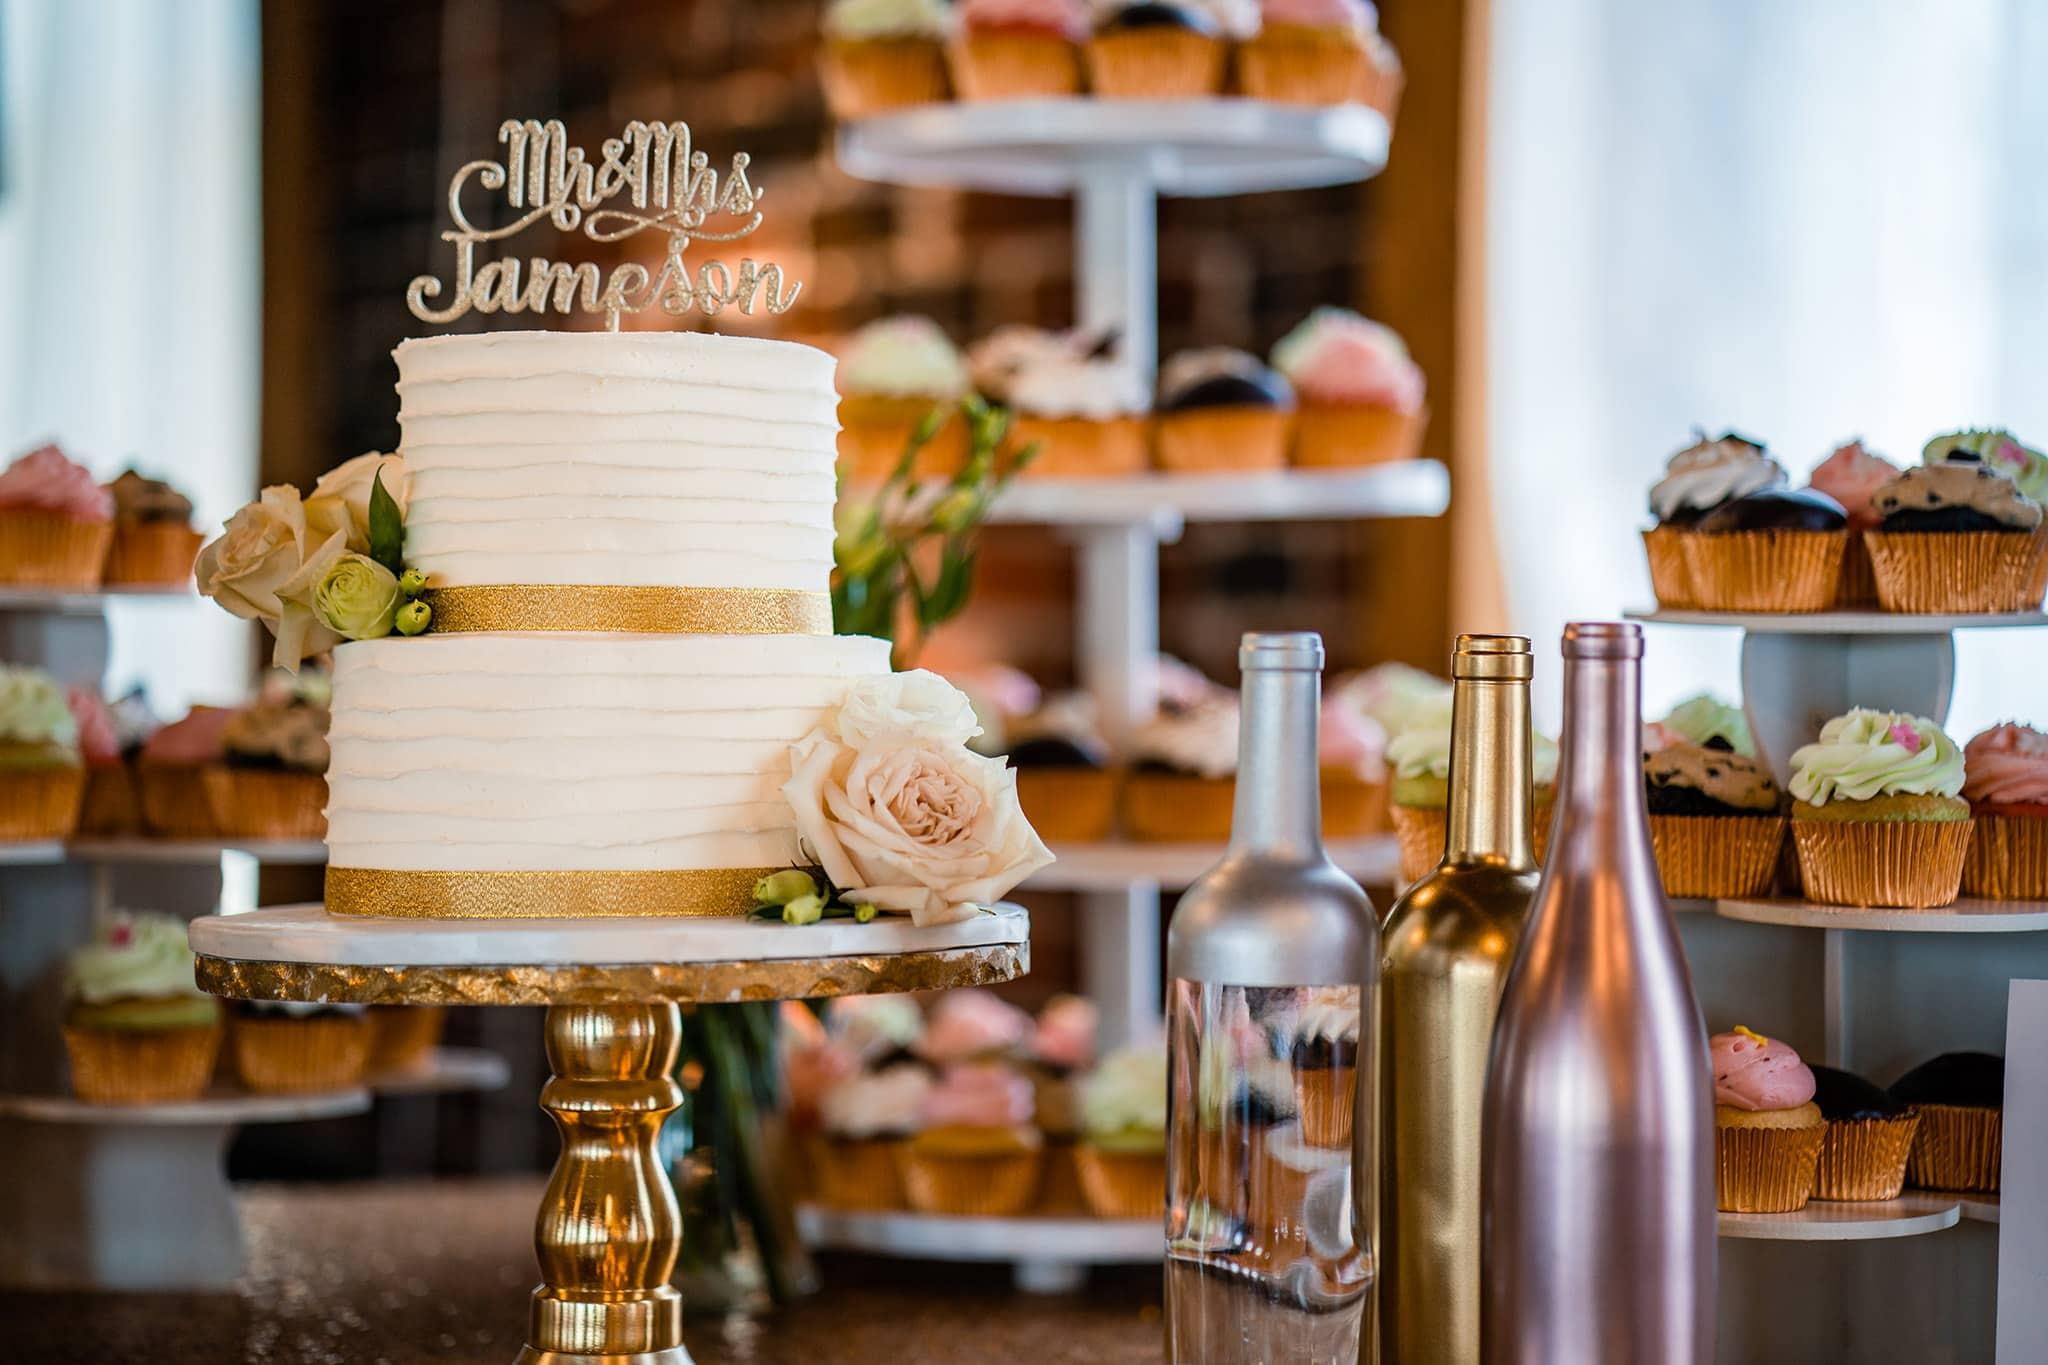 Studio 22 Photography - Destination Wedding & Engagement Photographer